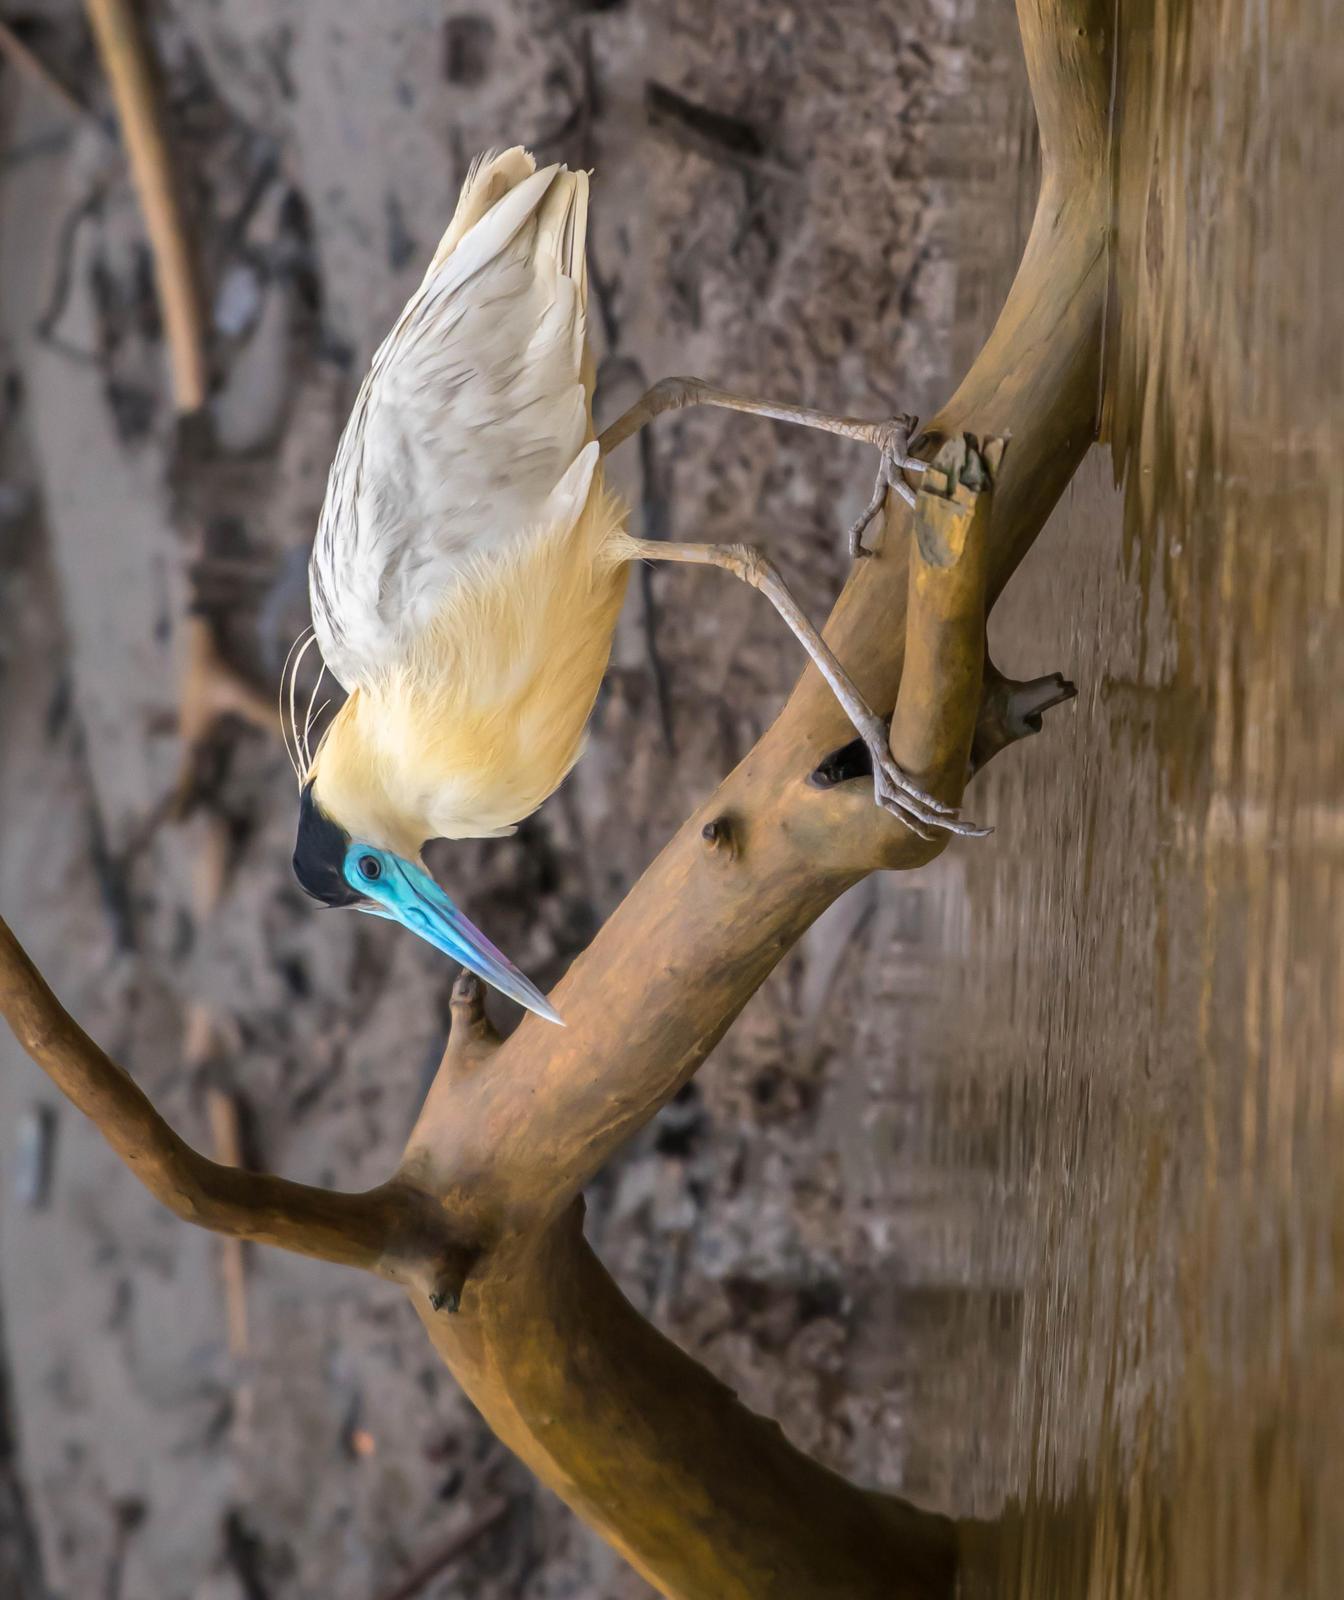 Capped Heron Photo by James Hoagland